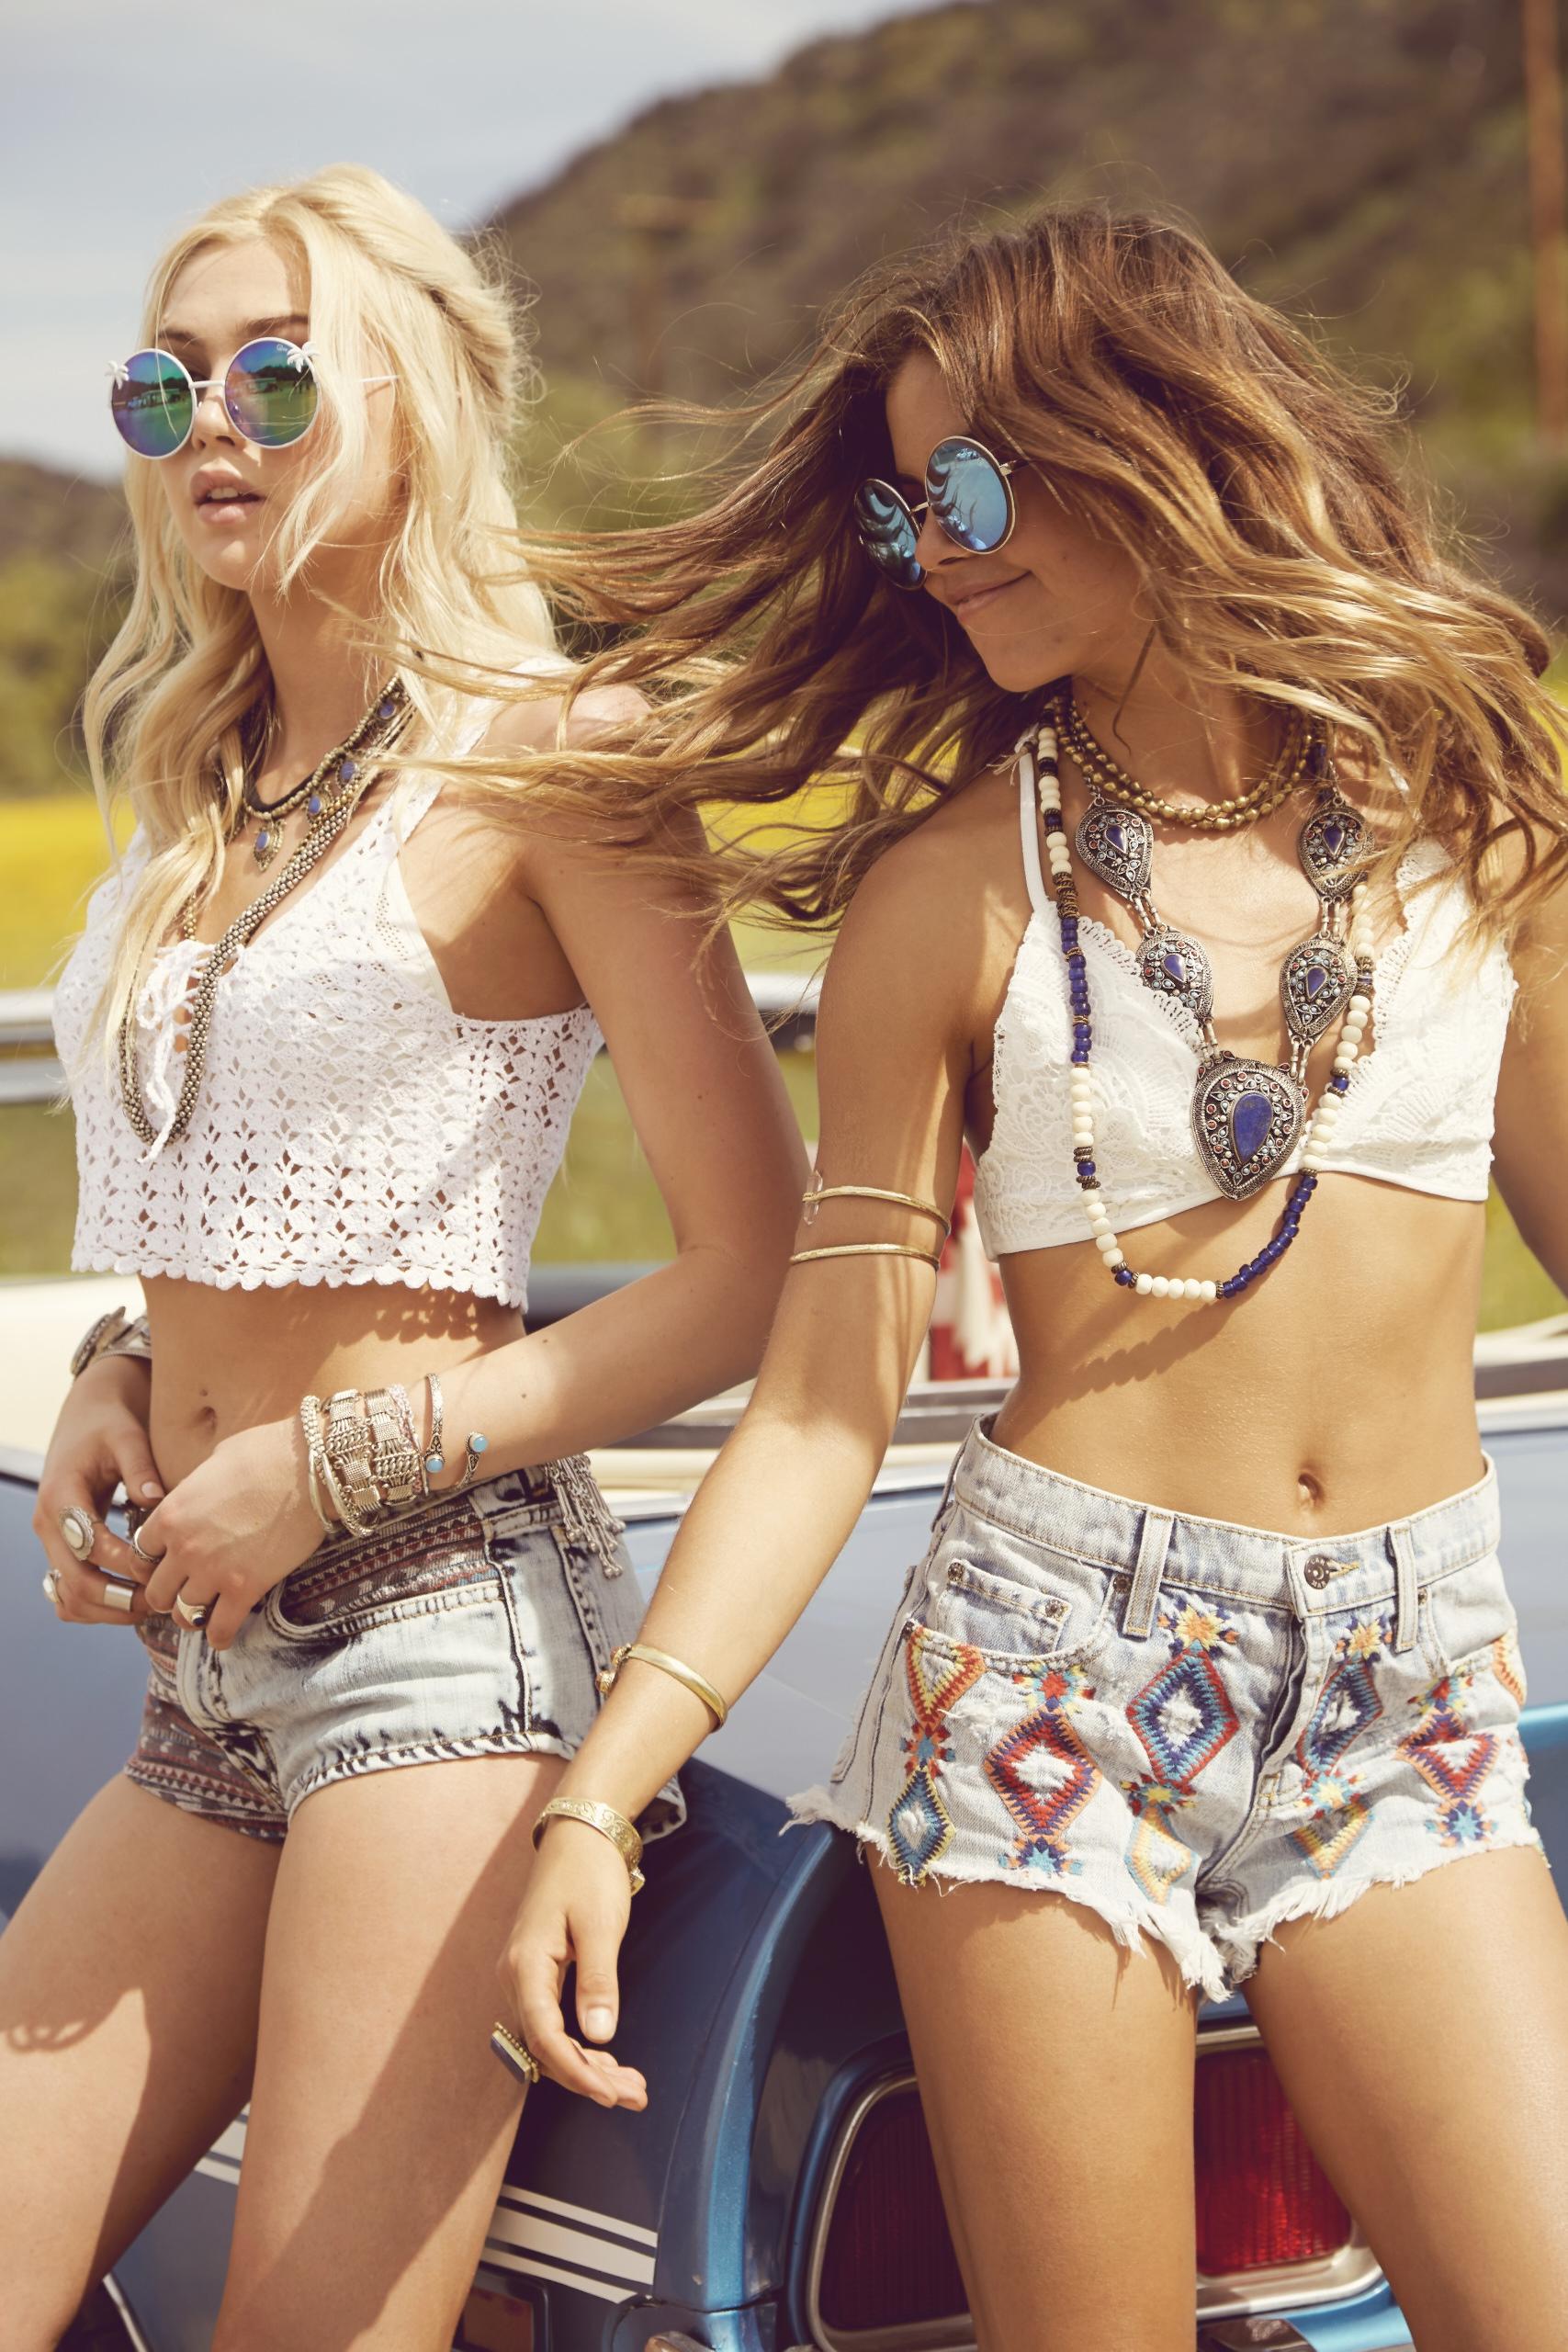 2015_03_10_Carmar_Coachella_0809.jpg